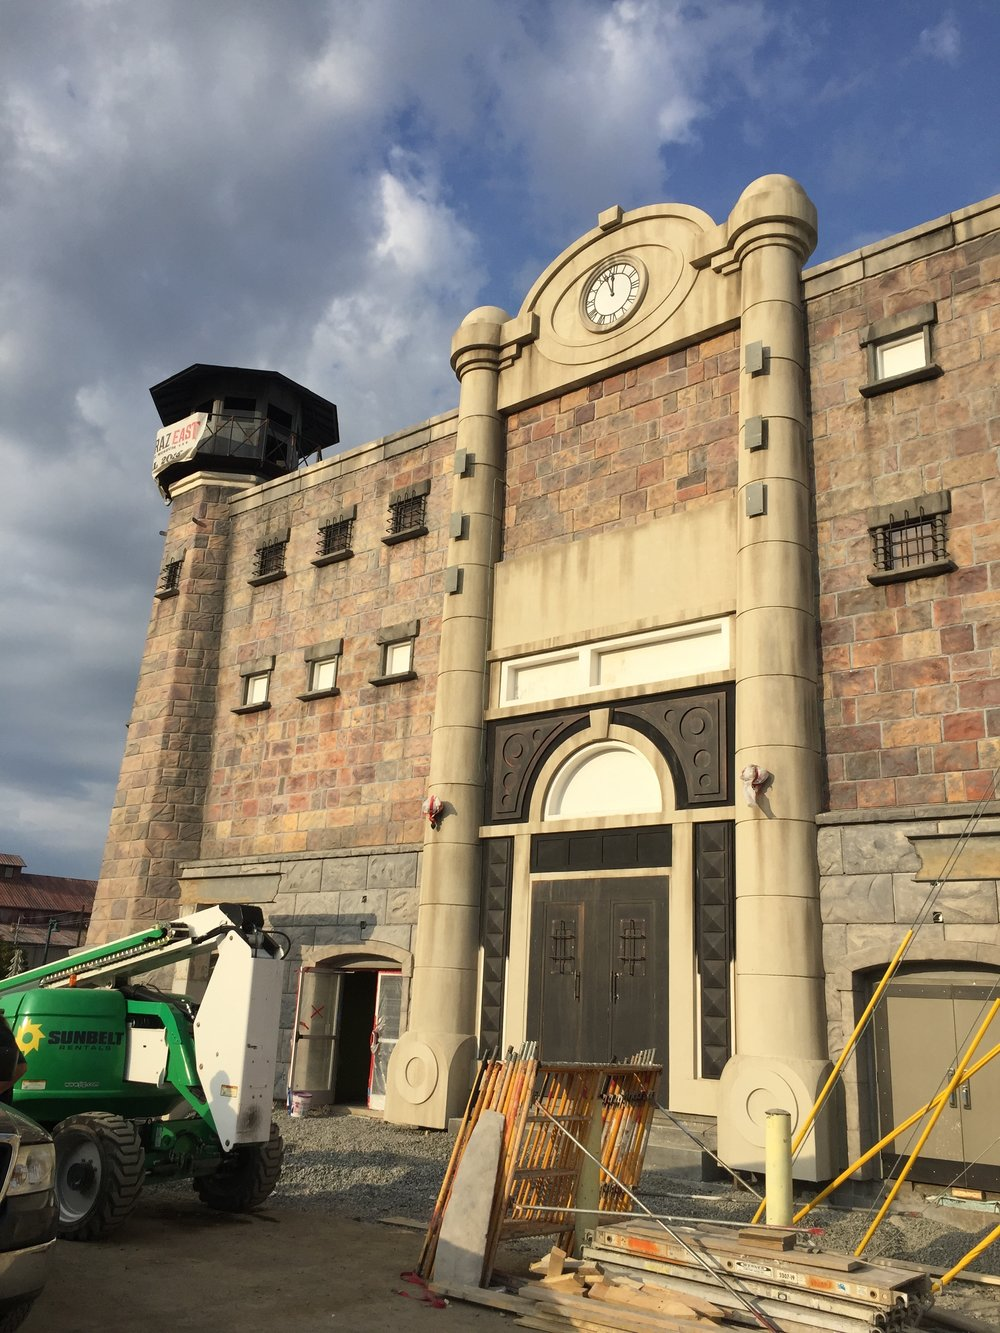 Alcatraz East prison cell in progress.